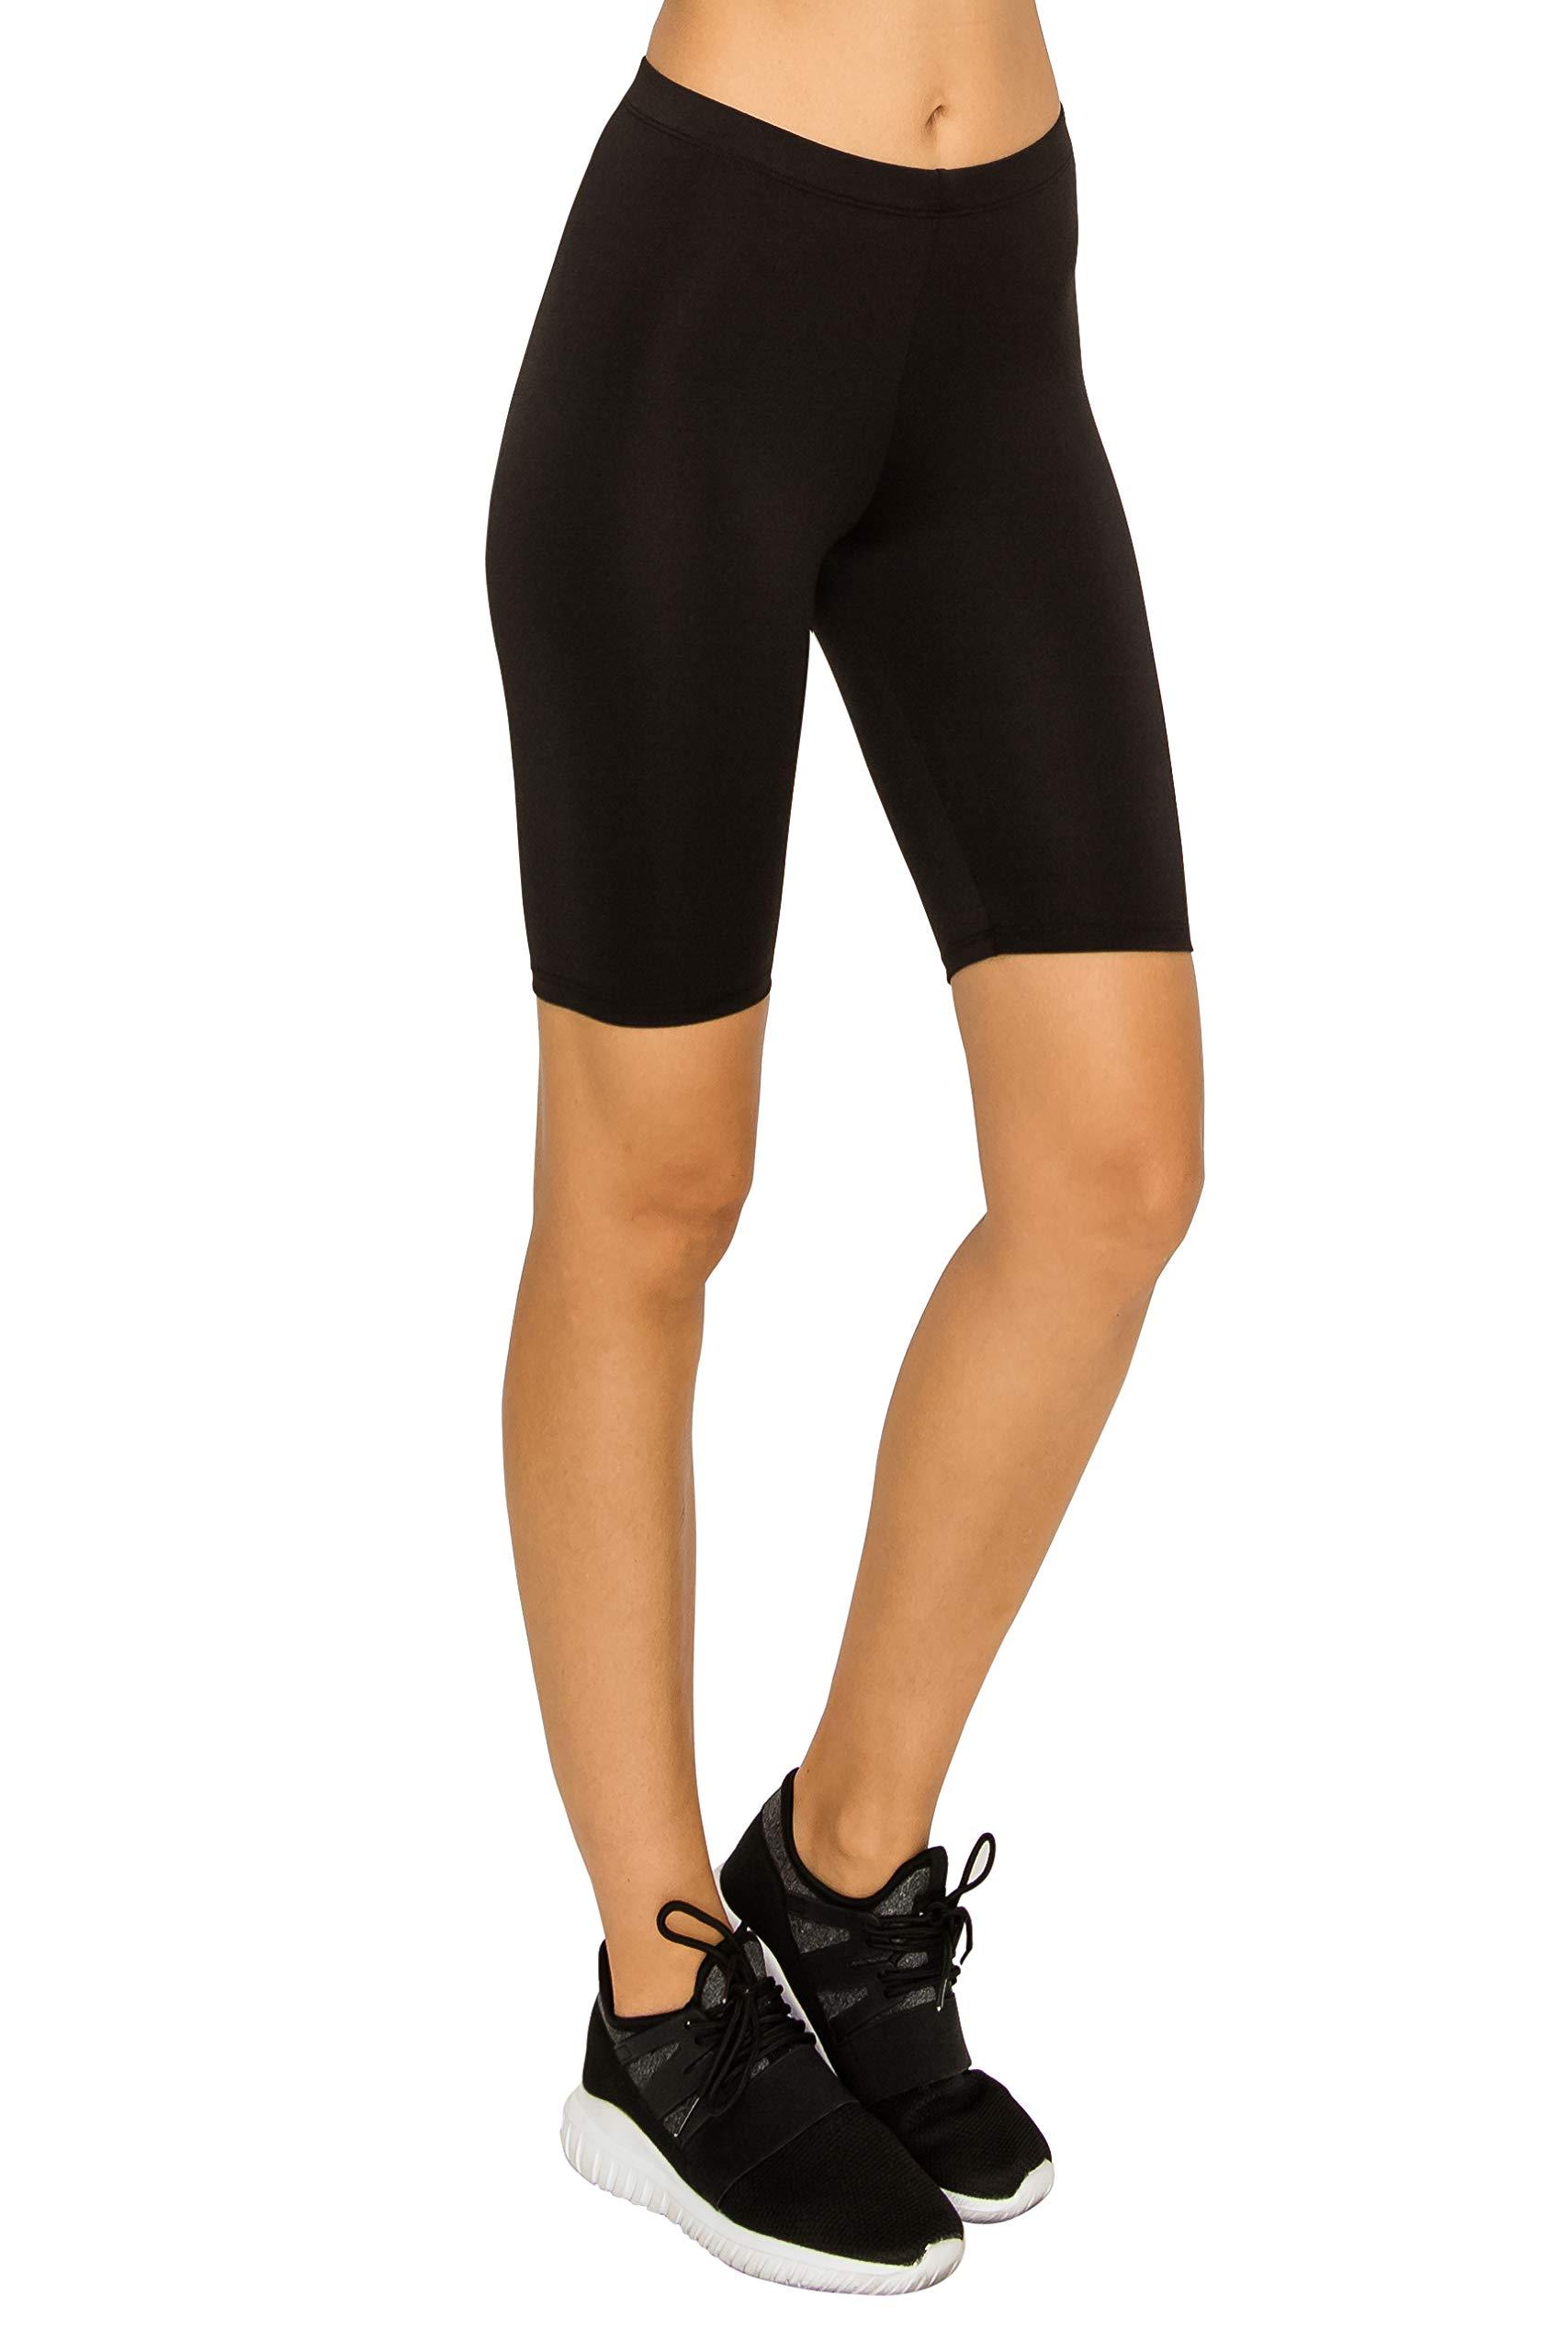 EttelLut Athletic Spandex Volleyball Booty Shorts-Yoga Running Biker Gym Sport Workout